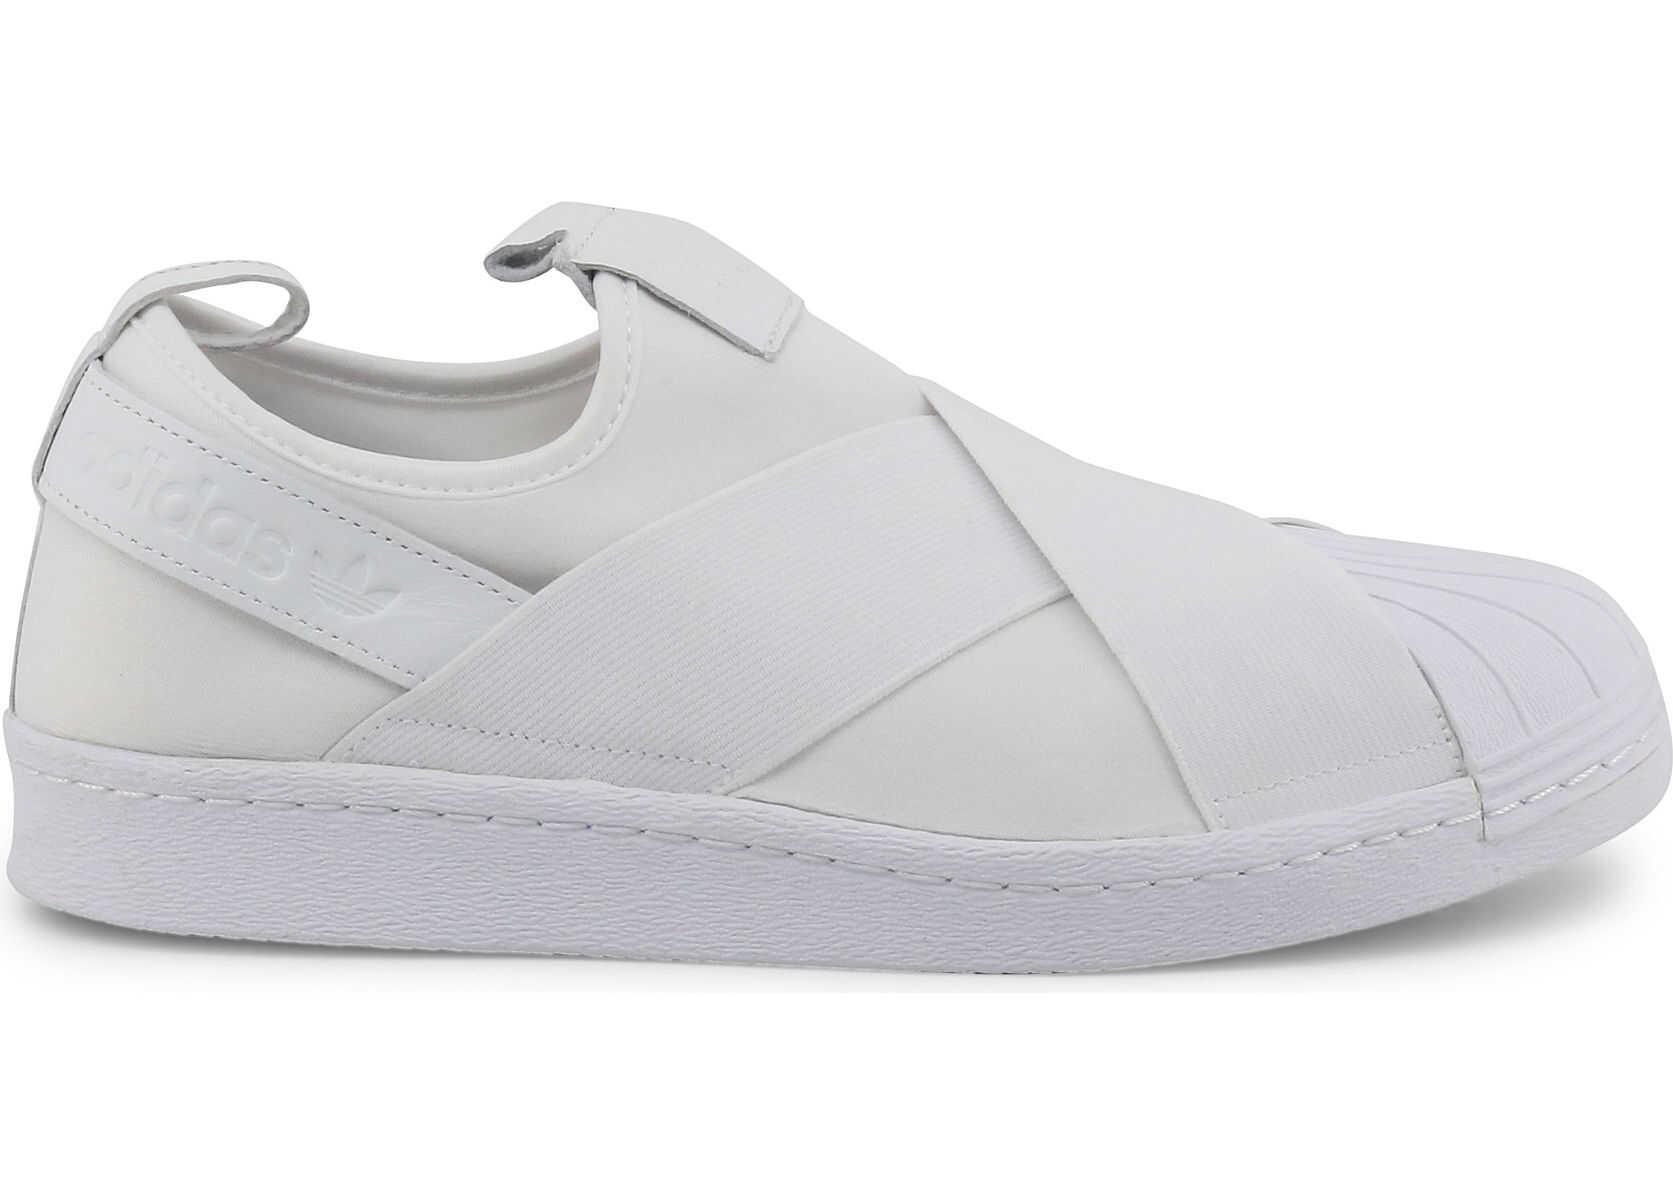 adidas Superstar-Slipon WHITE